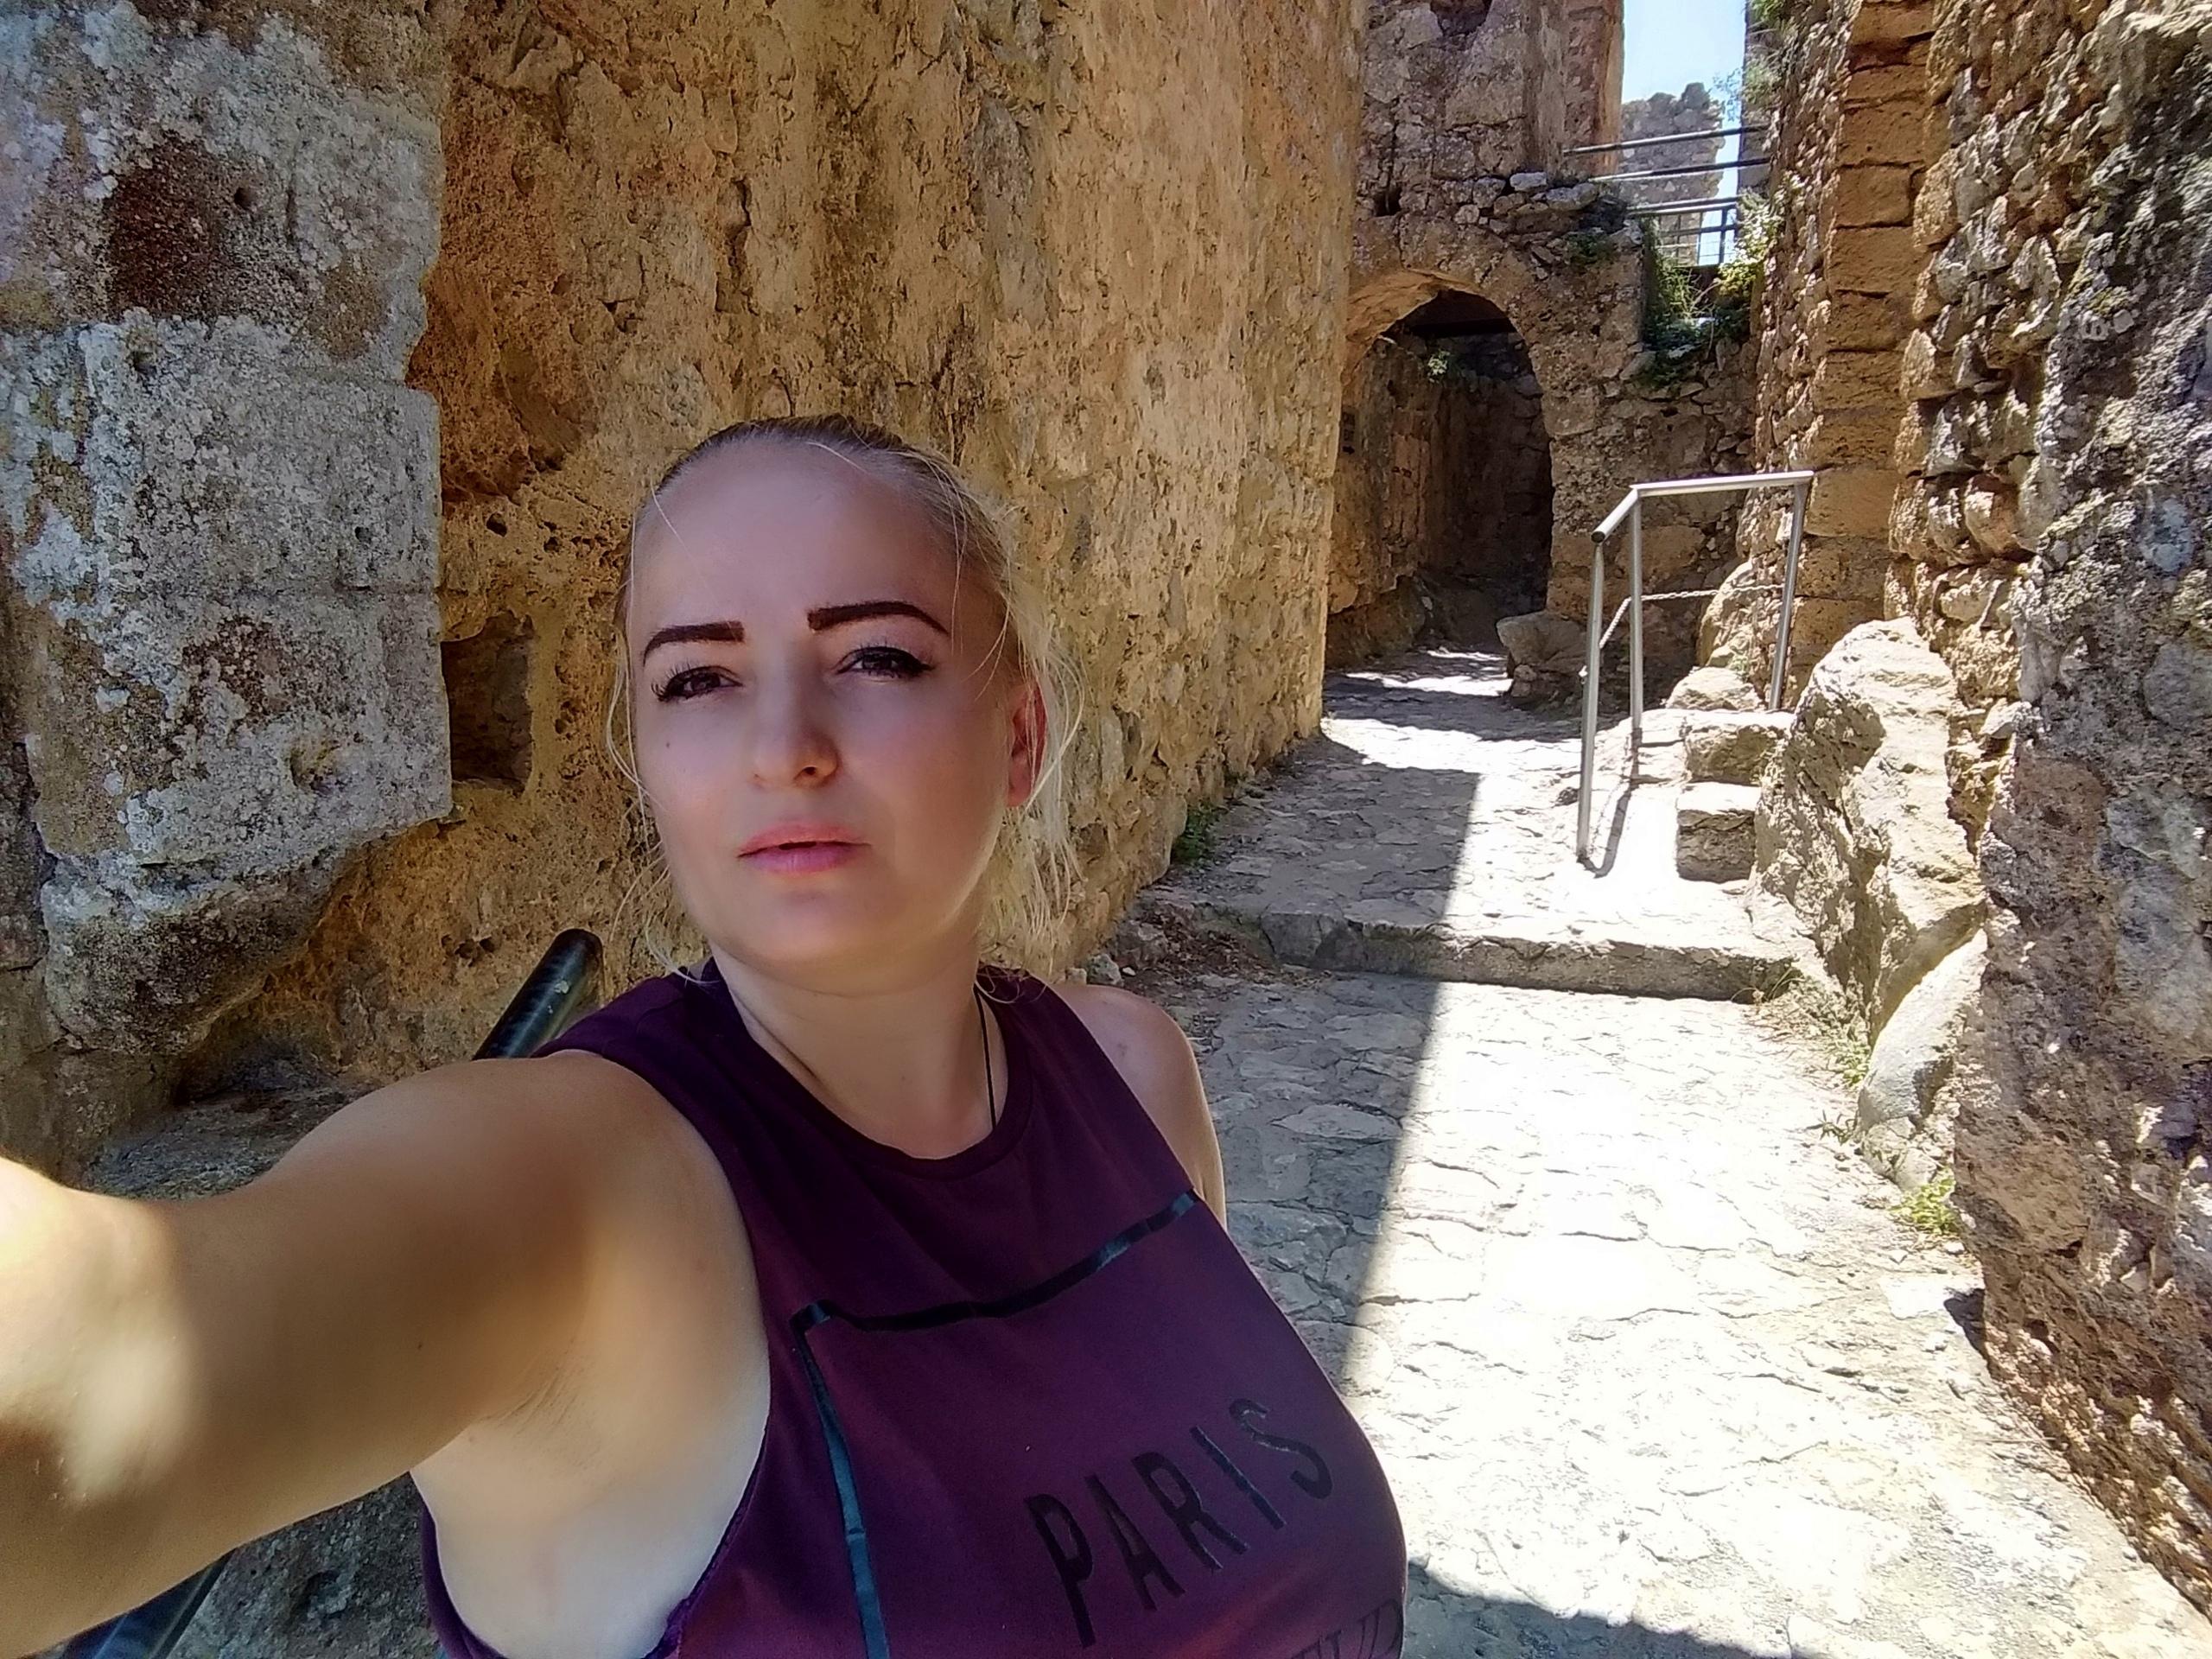 Елена Руденко (Валтея). Северный Кипр. Кериния и Фамагуста. (фото) LN3E_jJgP14